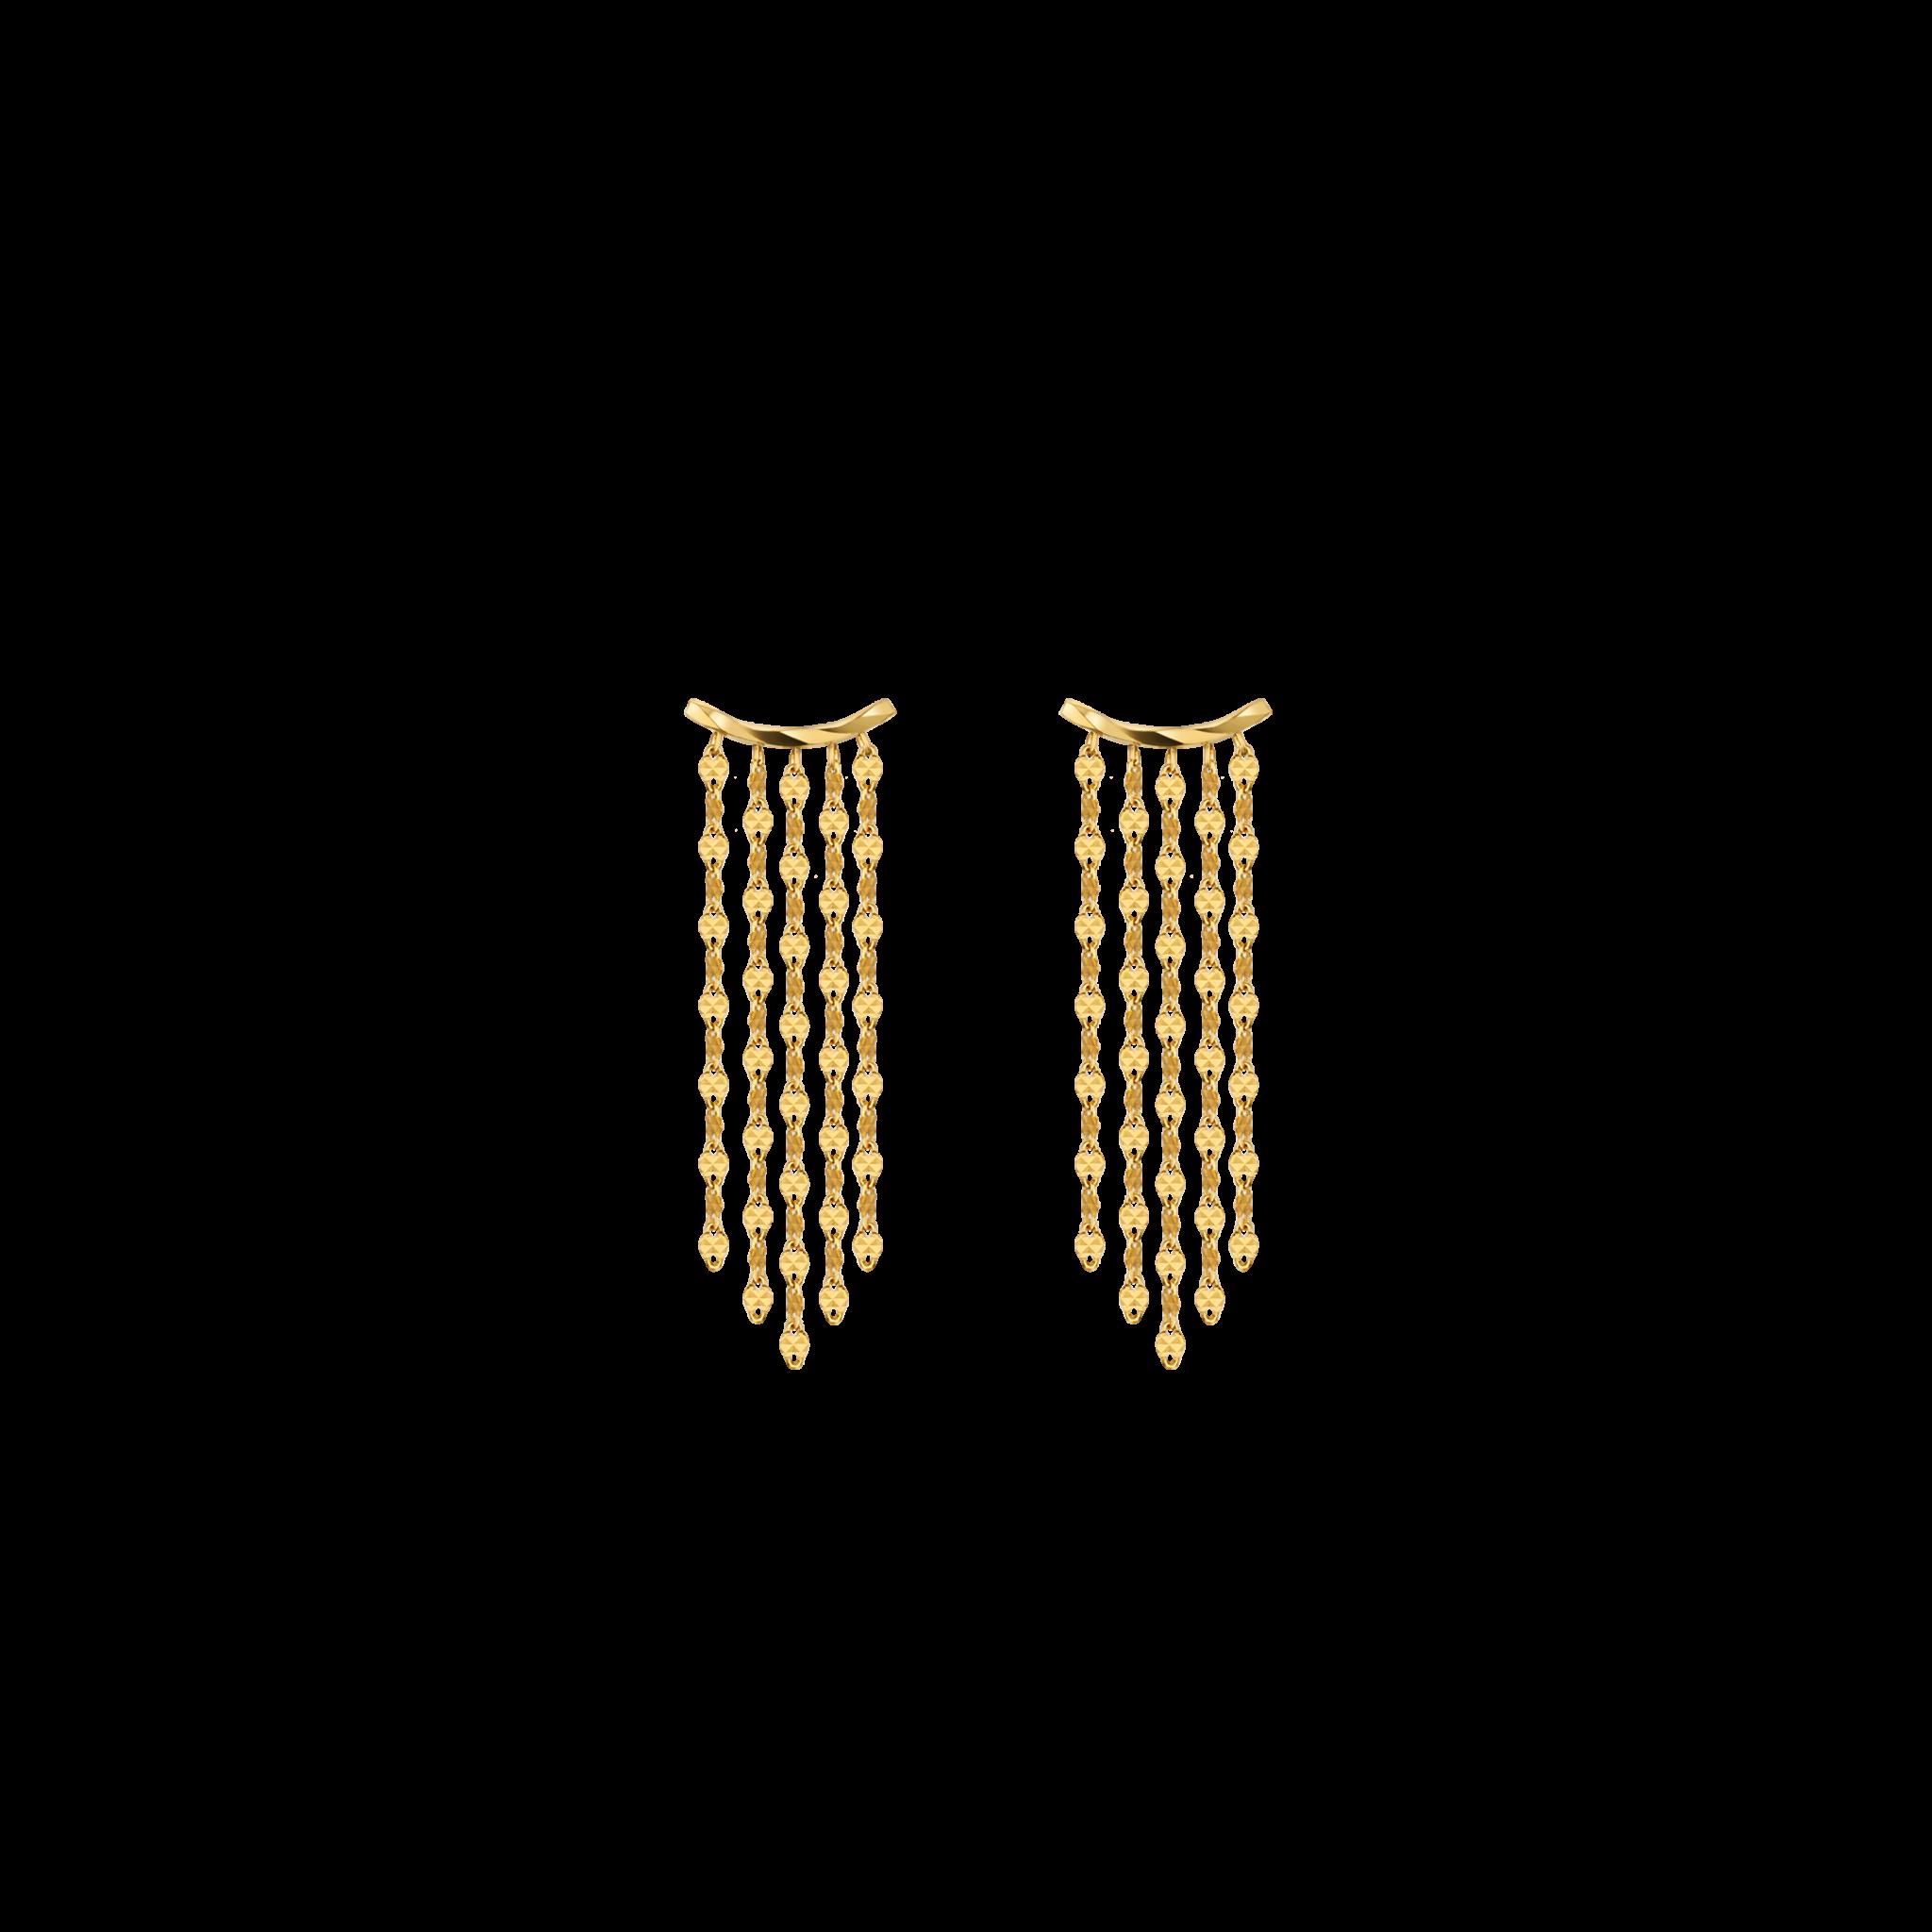 Flame Collection Eblouissant 18K黄金瀑布耳环(短款)2999